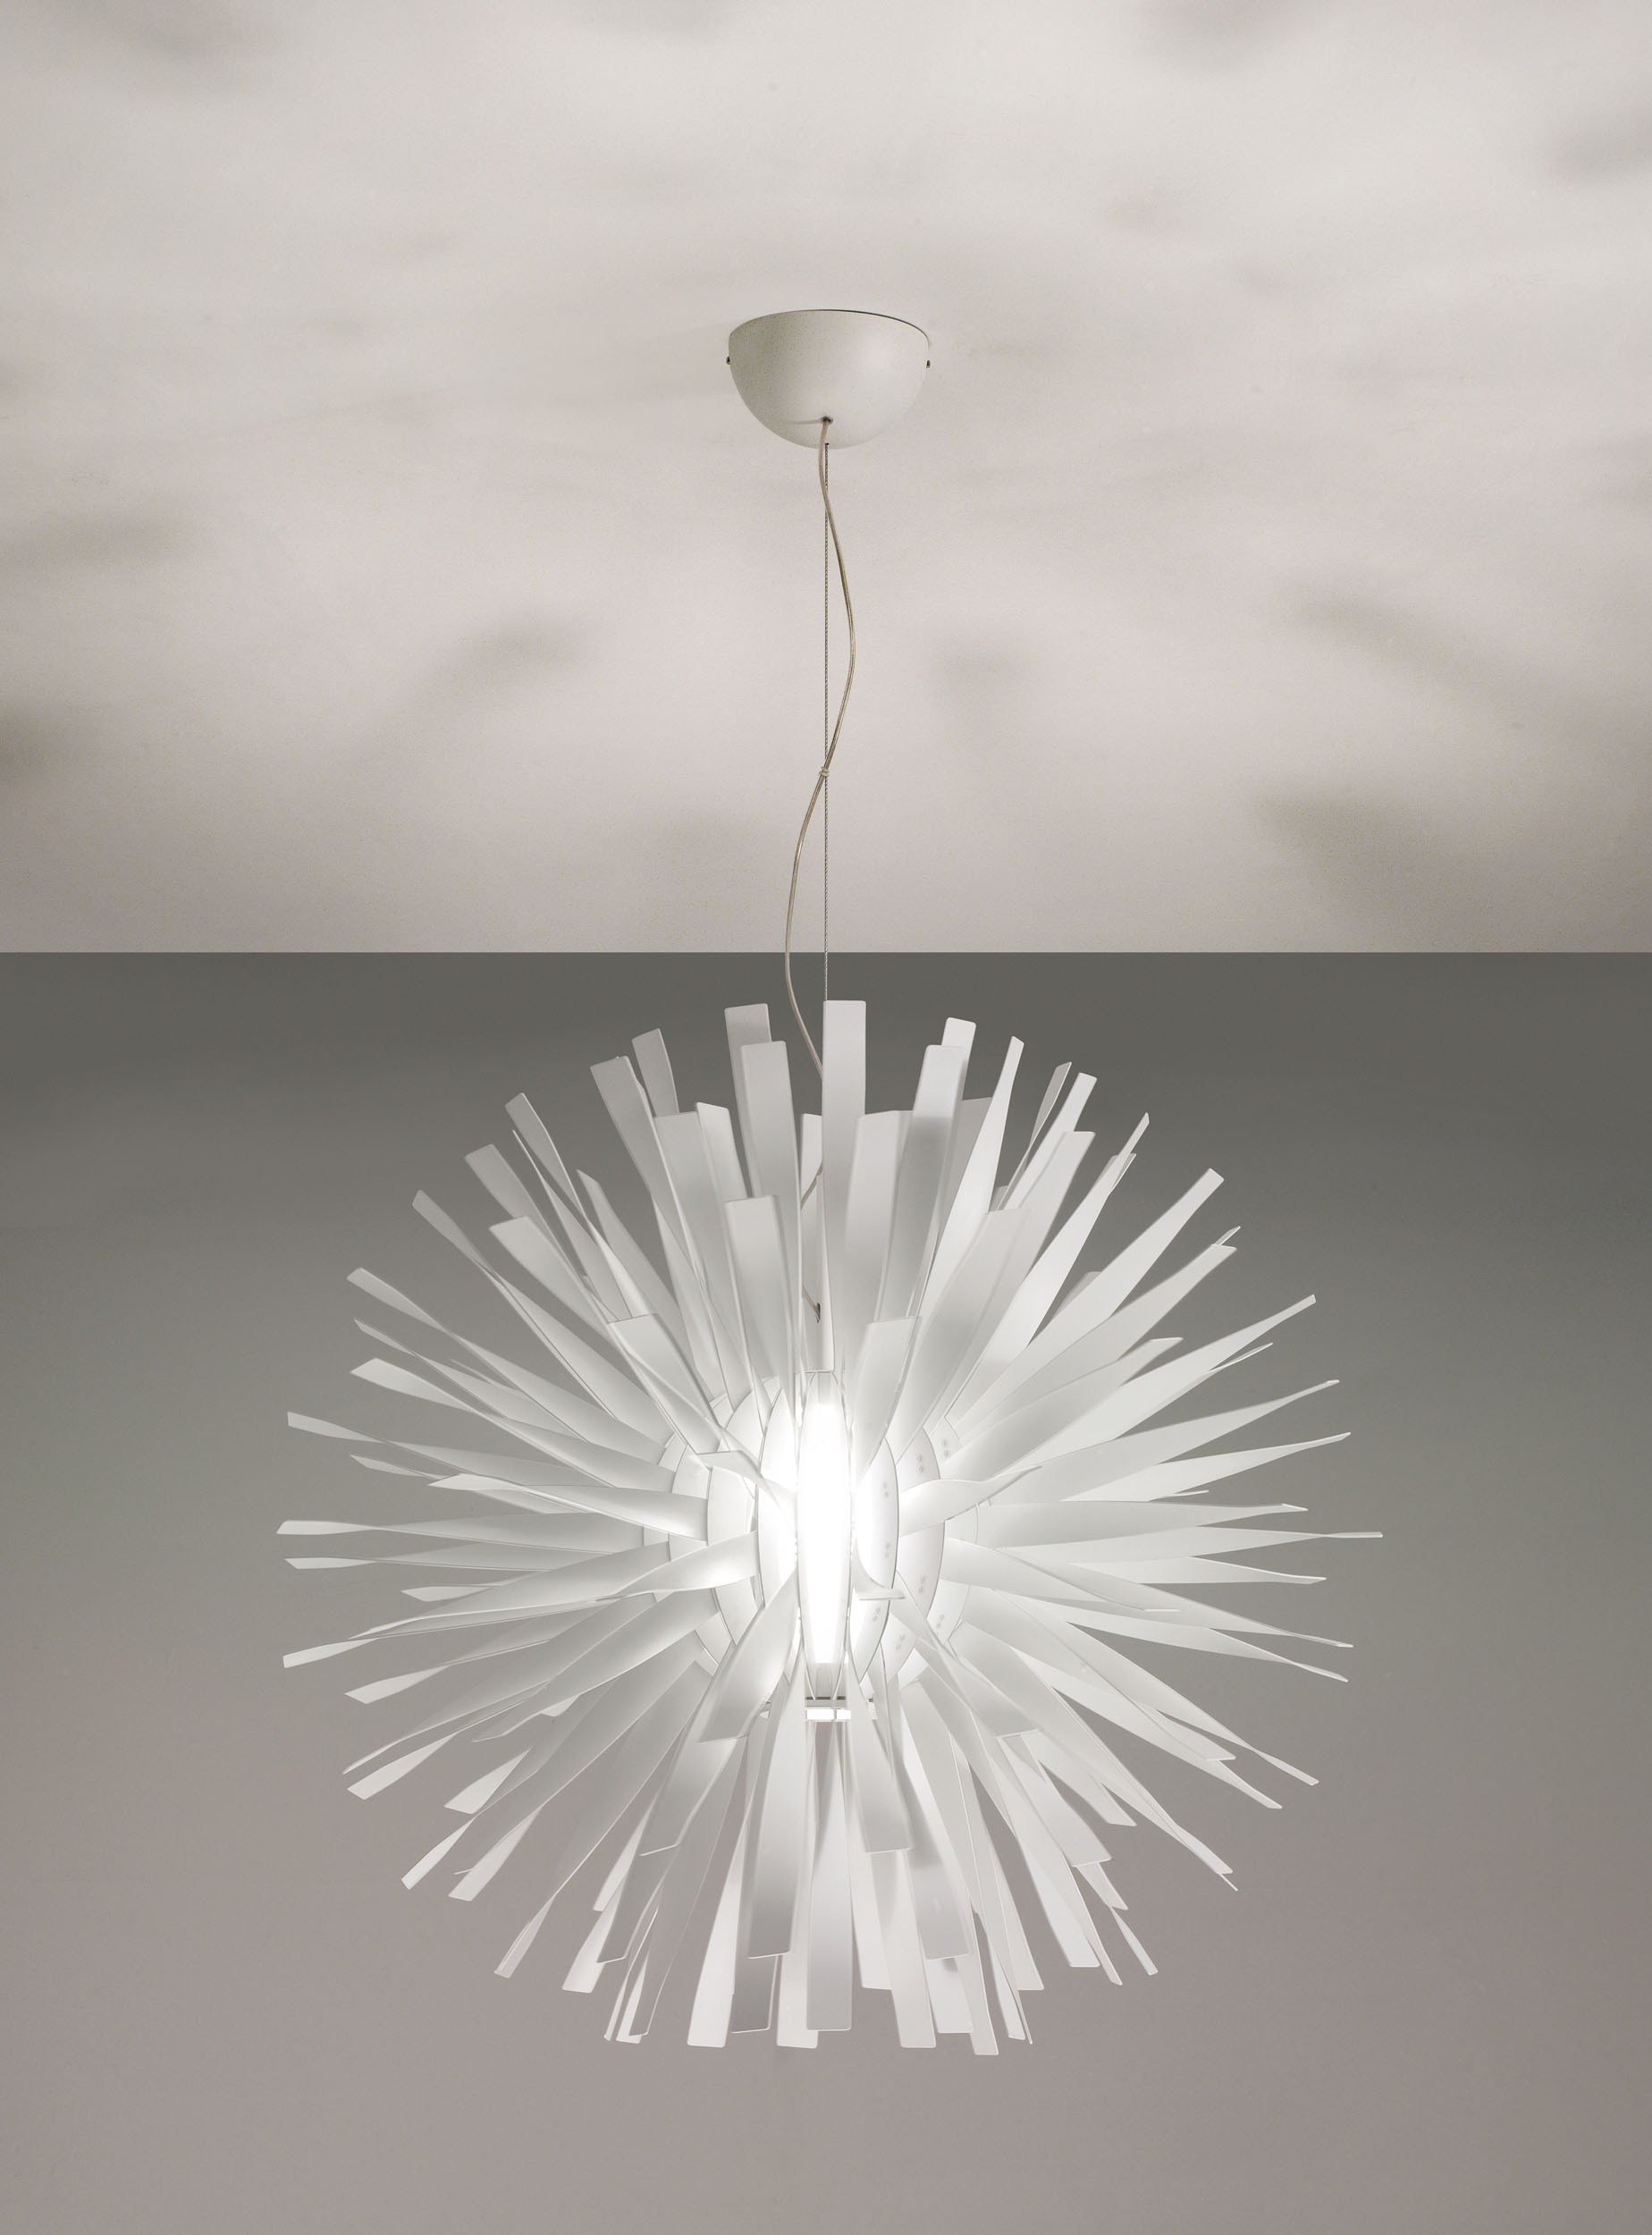 aluminium pendant lamp alrisha axo light line by axo light design brian rasmussen. Black Bedroom Furniture Sets. Home Design Ideas